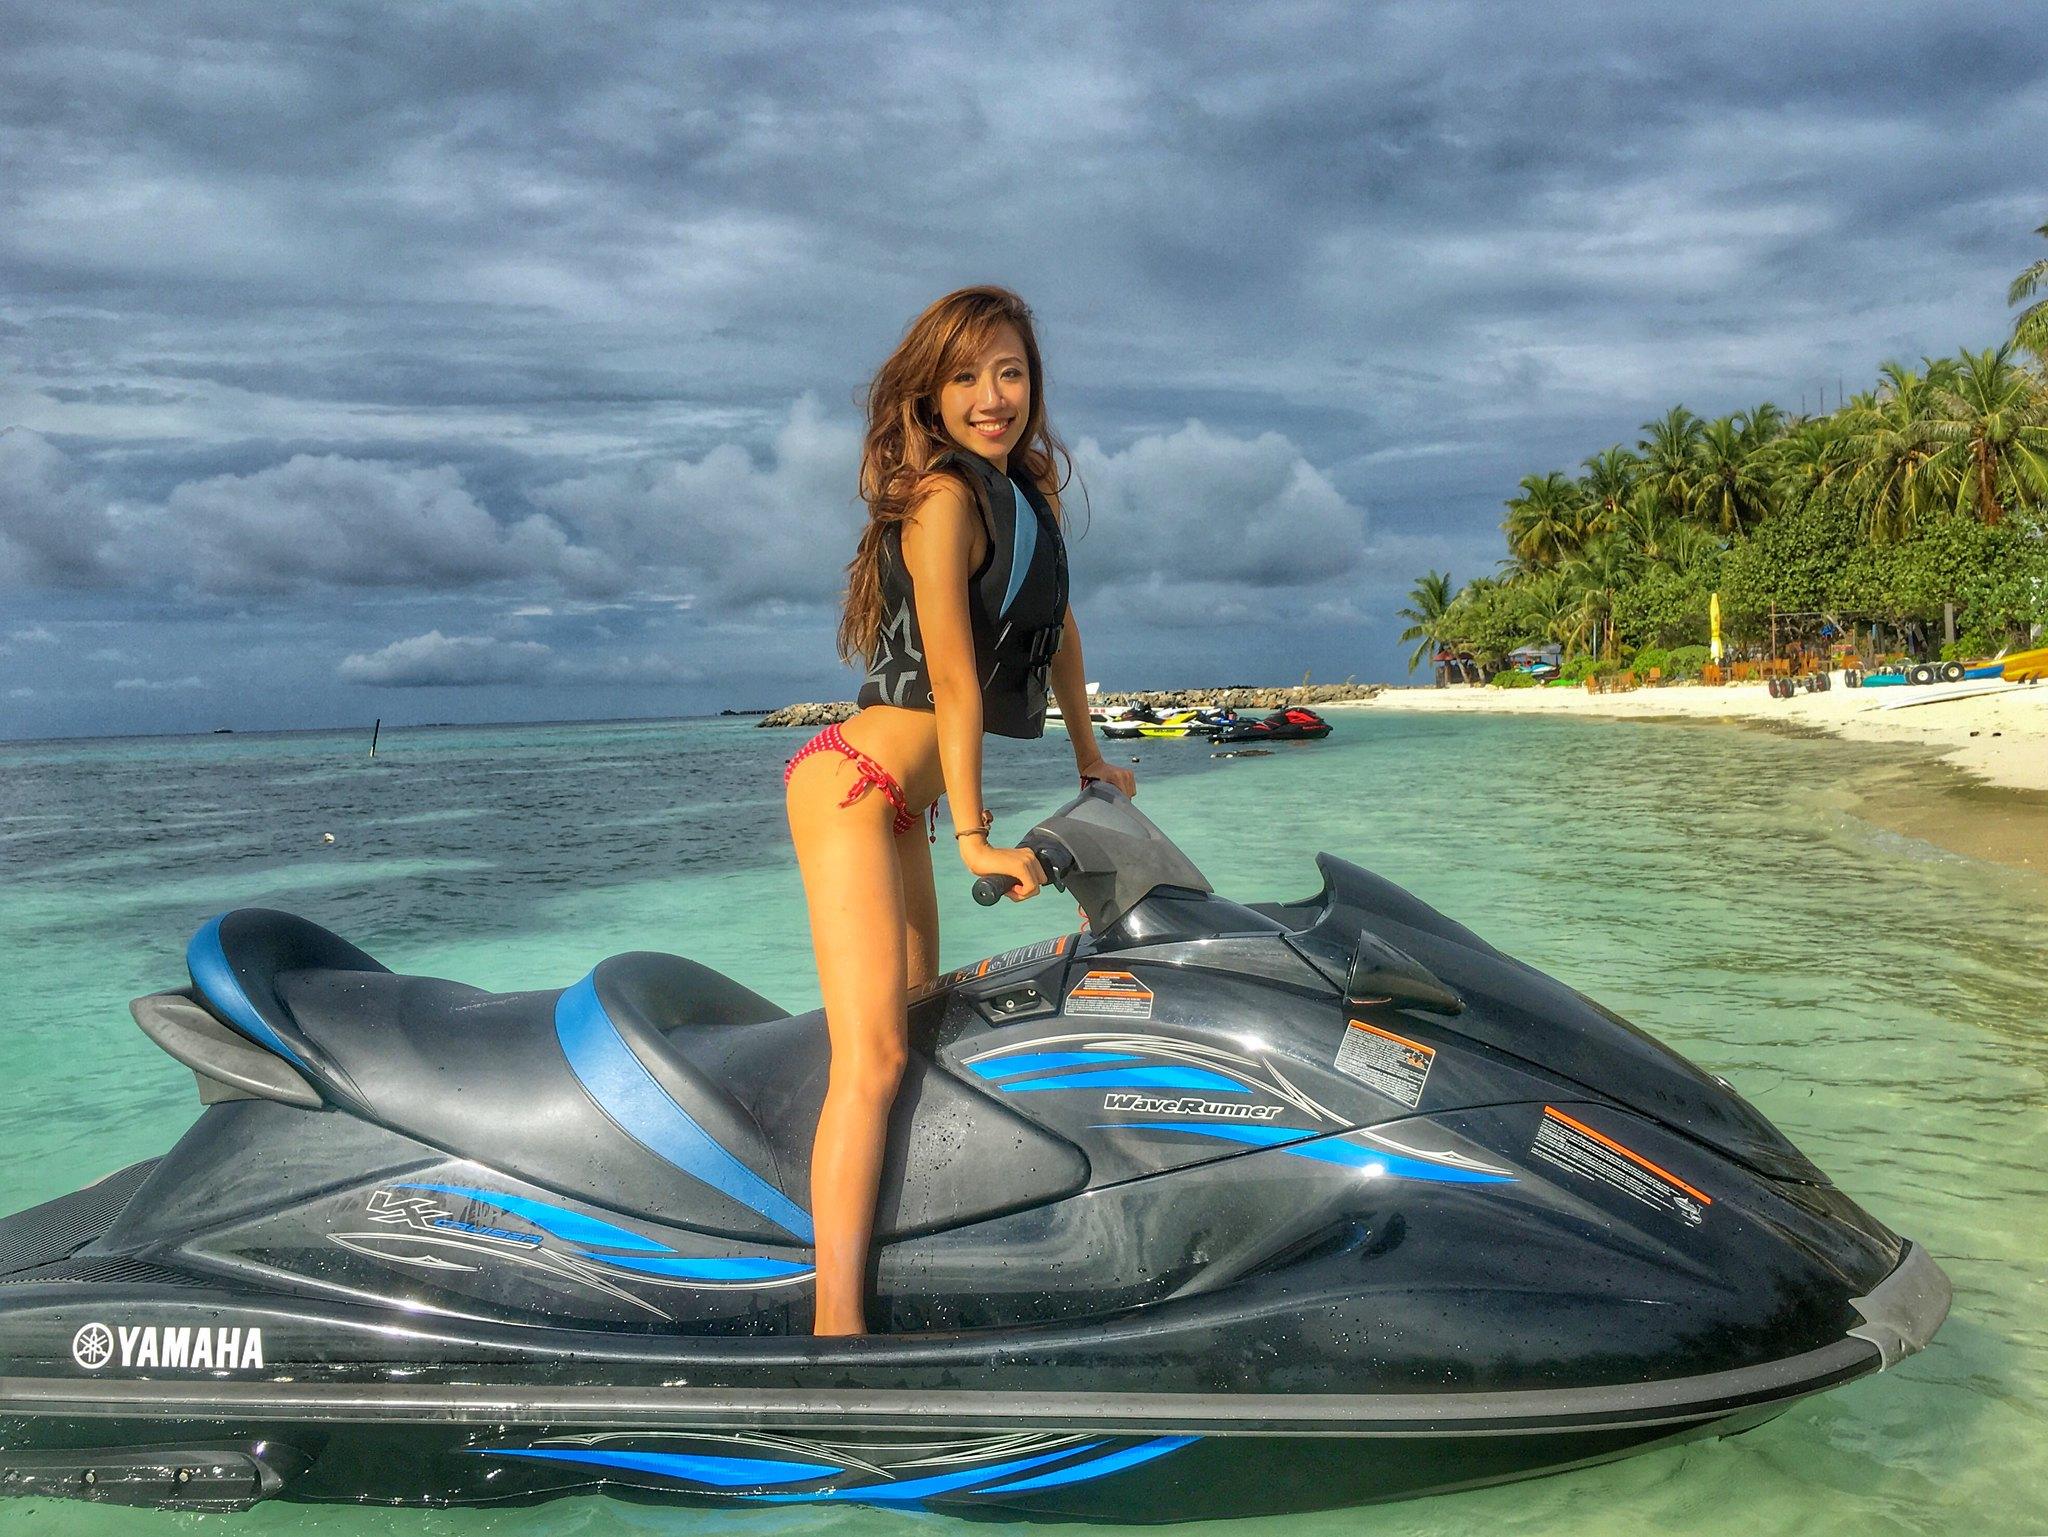 Maldives jet ski